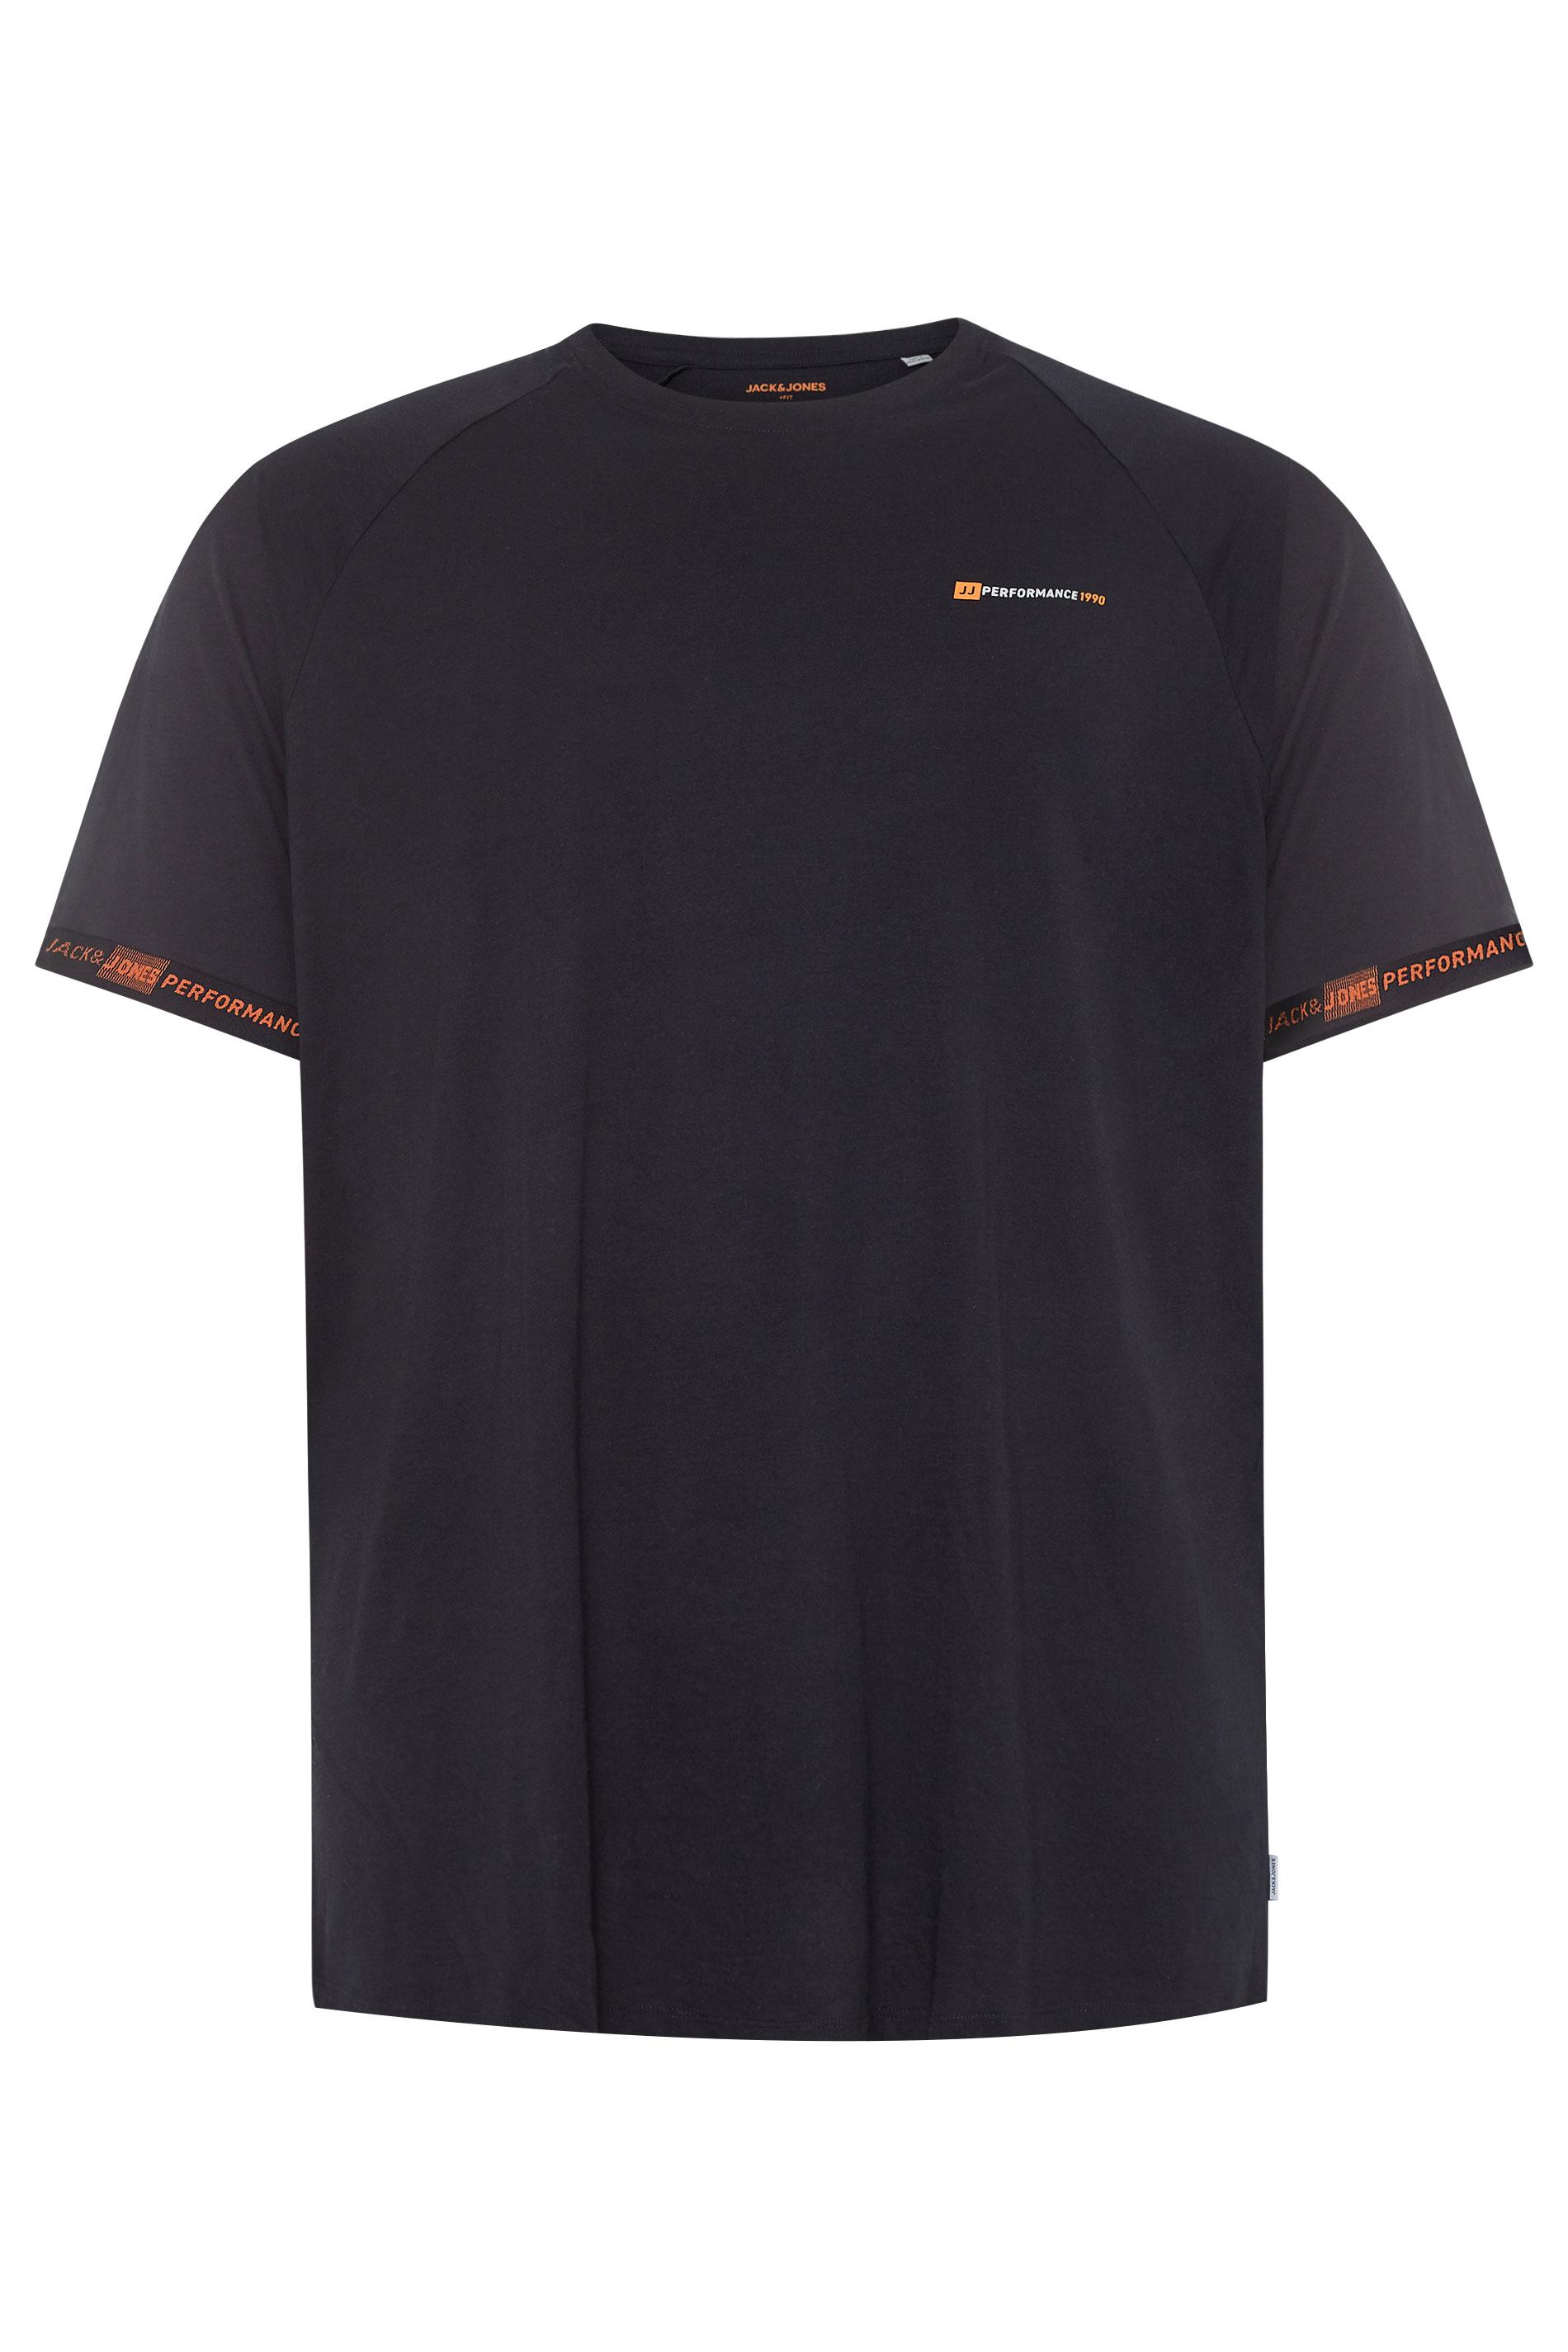 JACK & JONES Black Finn Performance T-Shirt